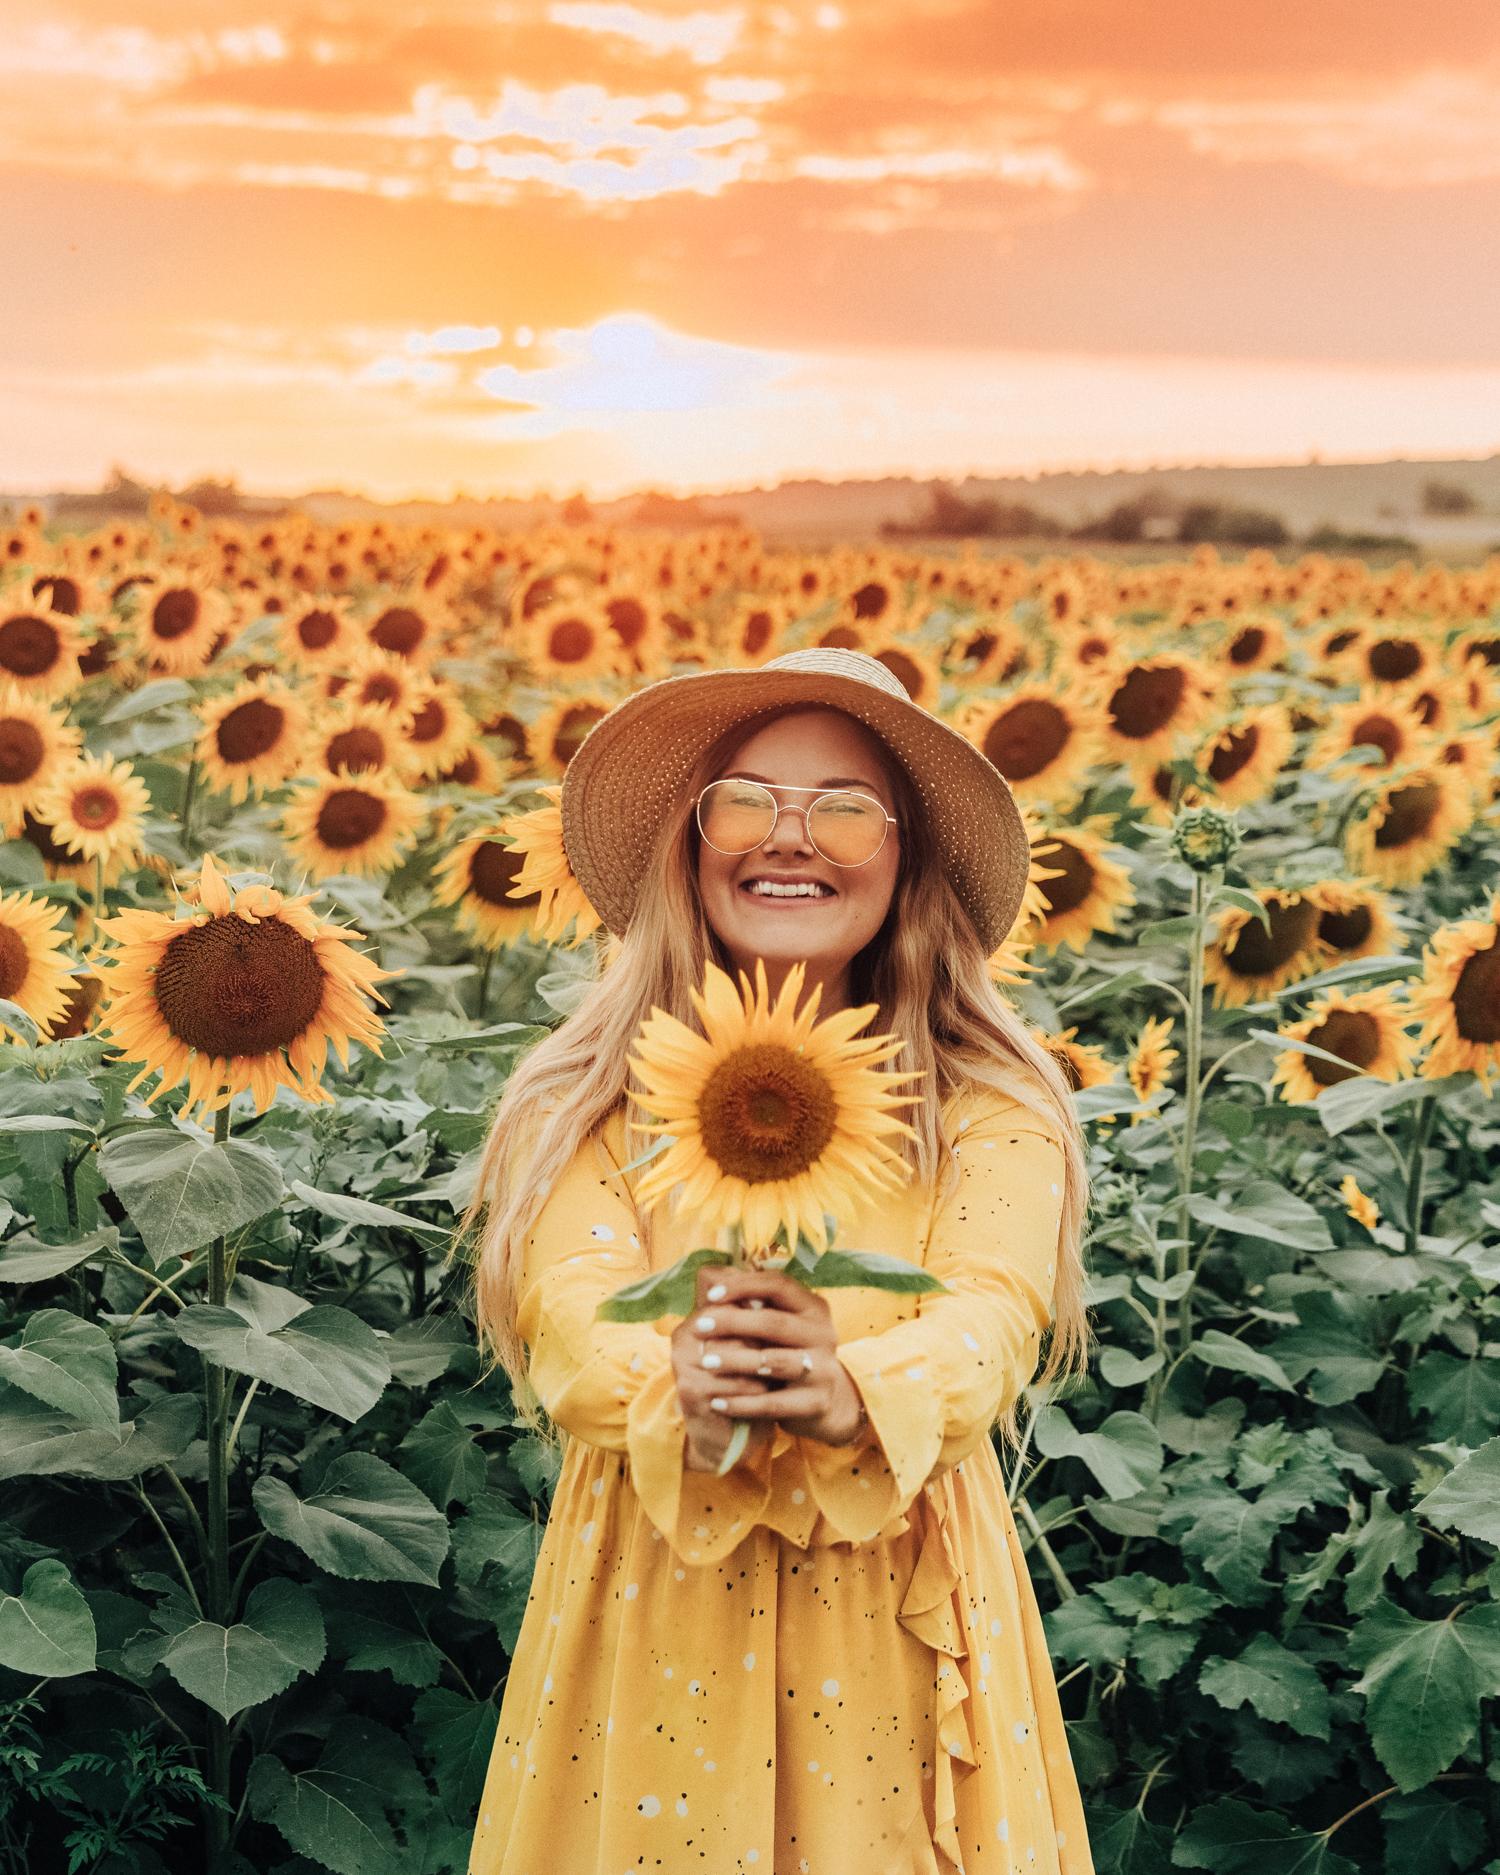 Ida Josefin Eriksson standing in a sunflower field in sunset in Slavonia, Croatia